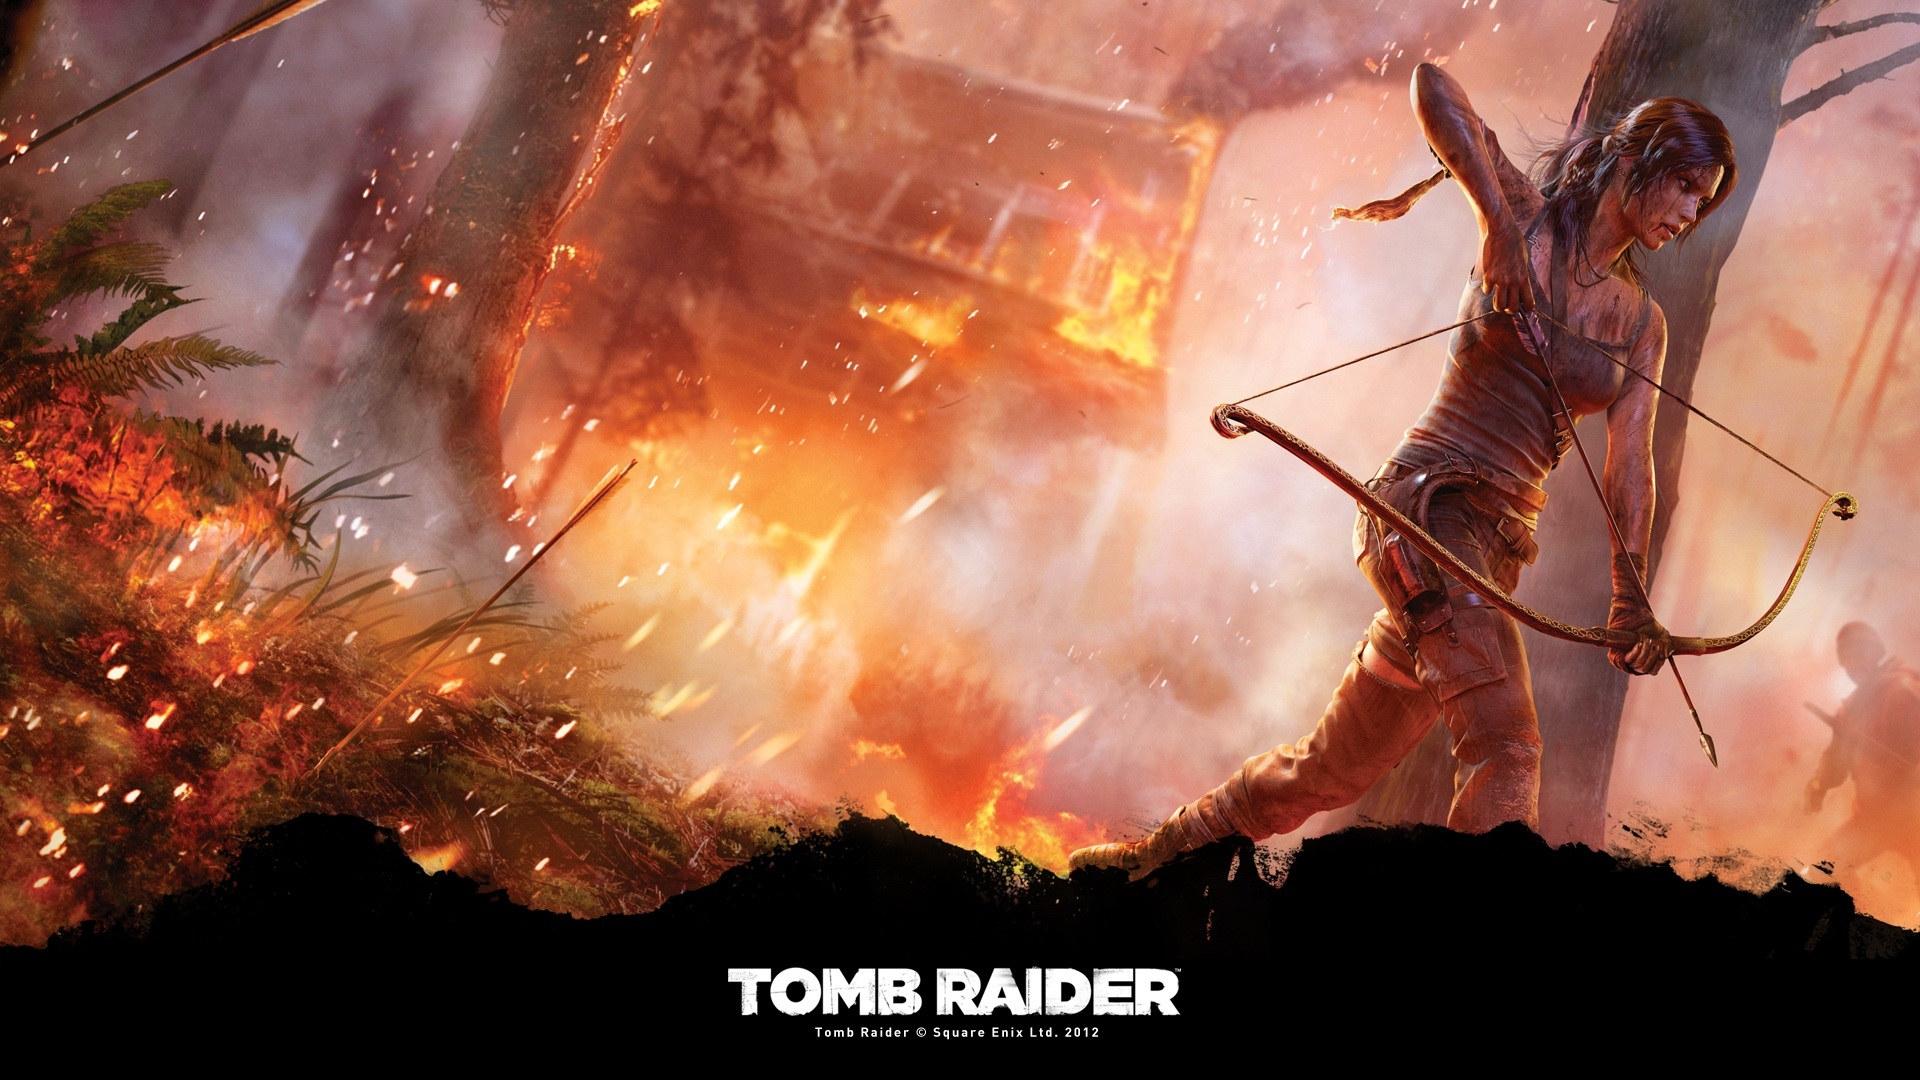 tomb_raider_2013_video_game-wallpaper-1920x1080+1.jpg